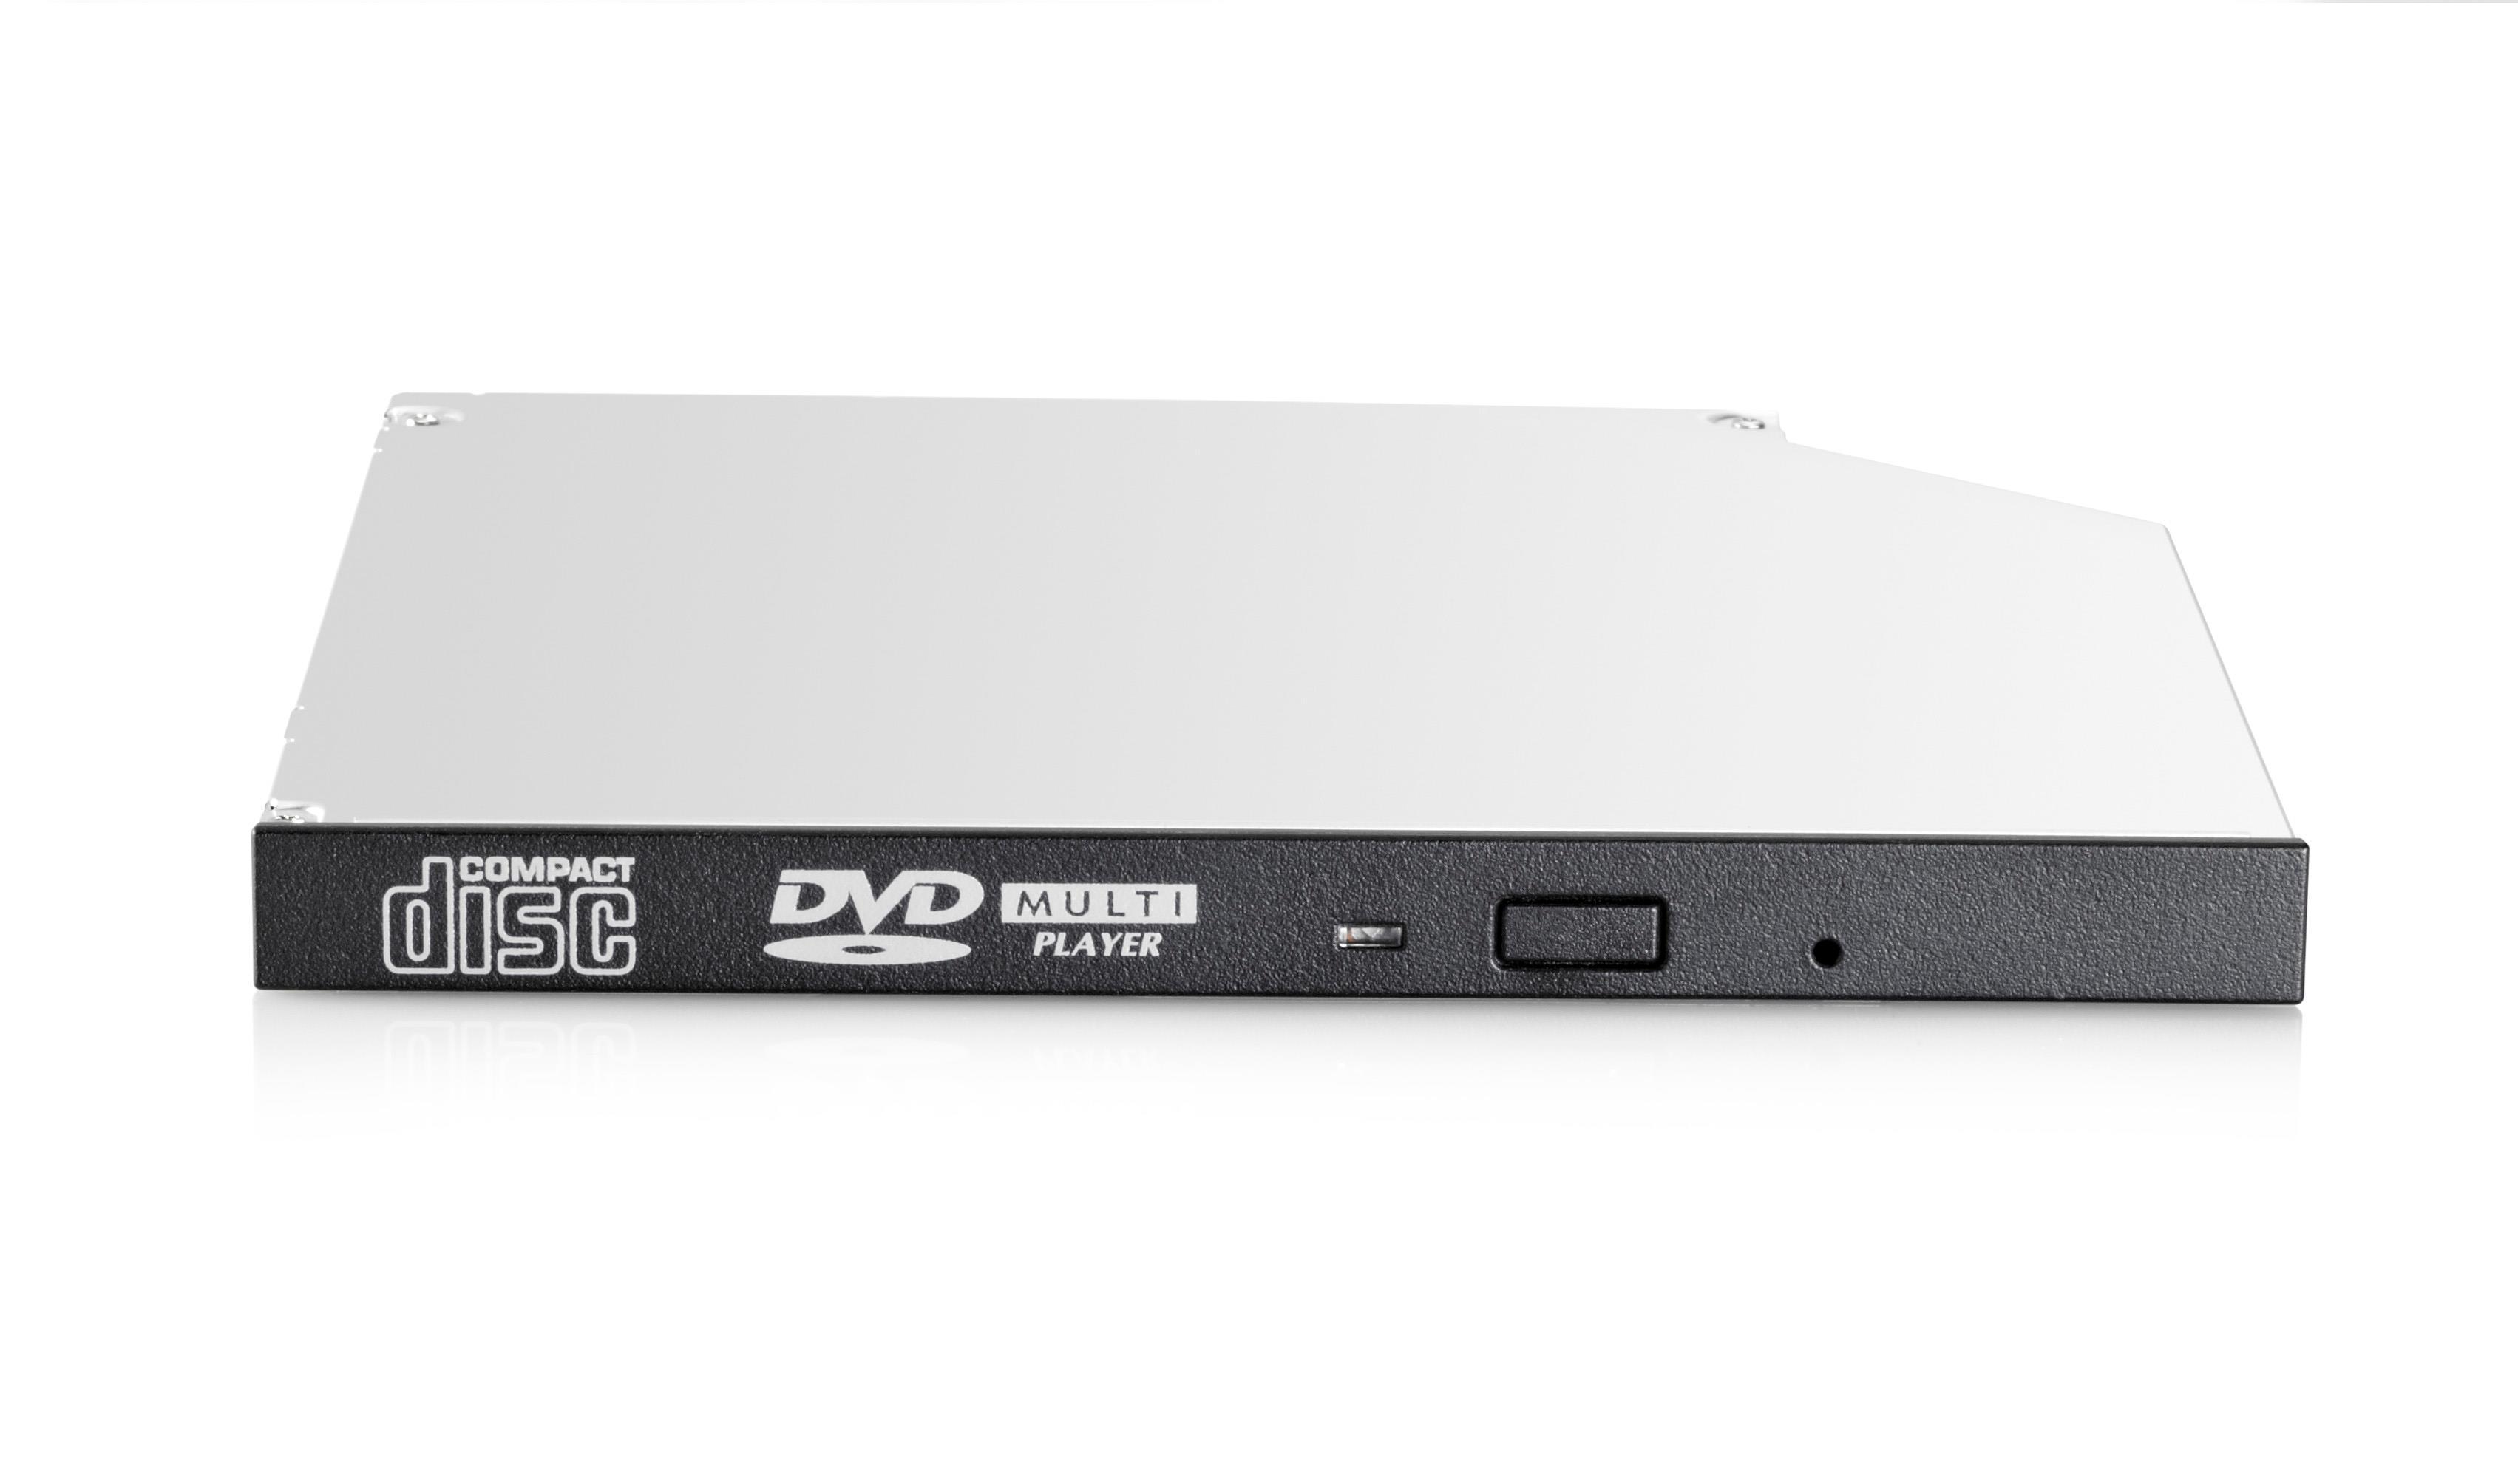 HP (9.5mm) DVD-ROM Optical Drive SATA (JackBlack) for ProLiant Gen9 Servers